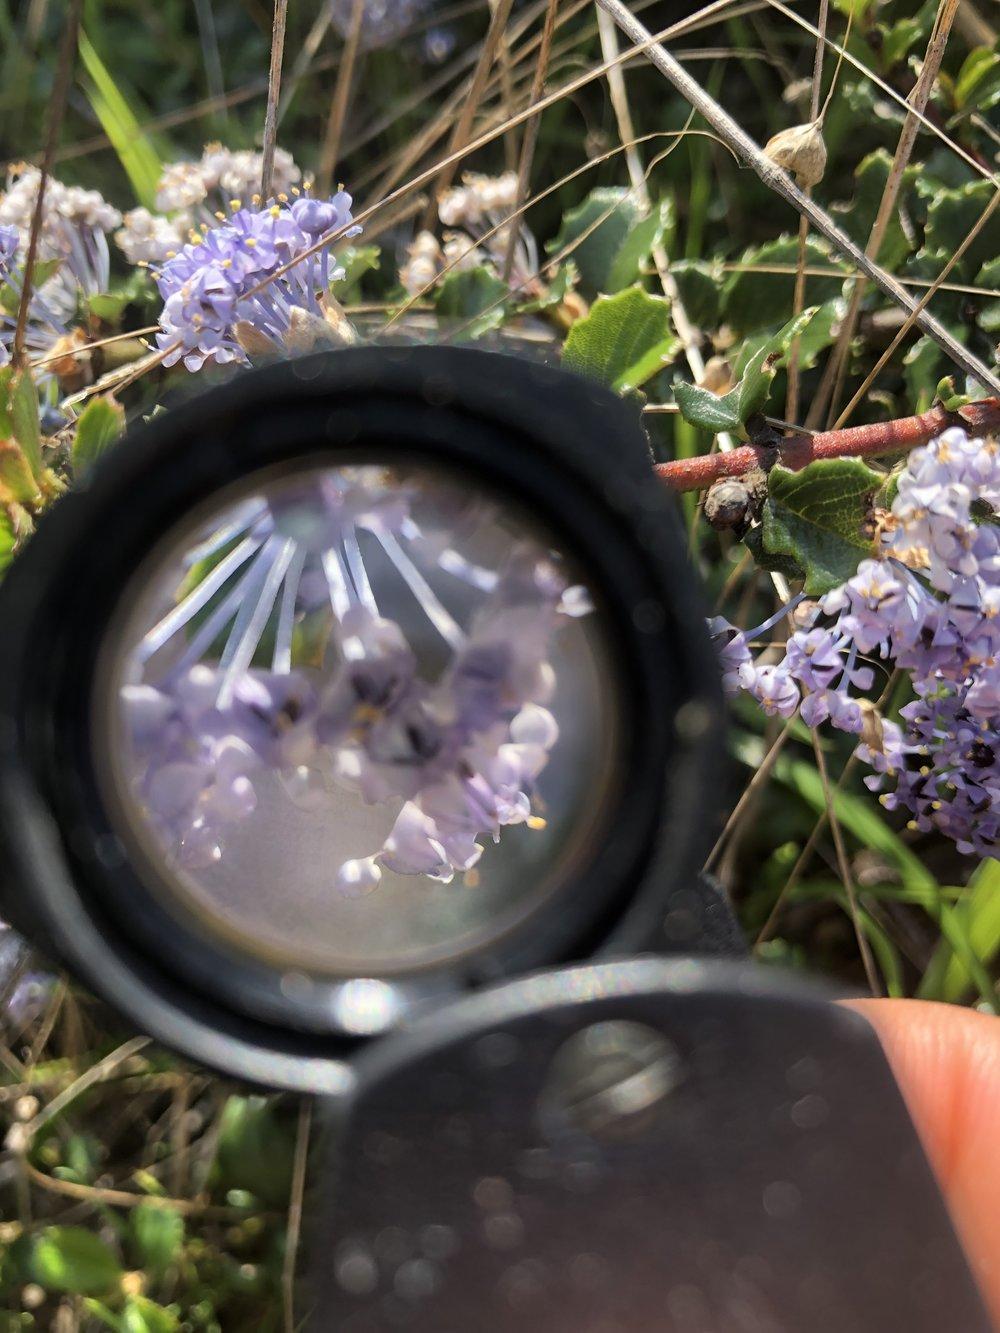 Ceanothus spp. flowers through a loupe. Taken Spring 2019 - Salt Point State Park.